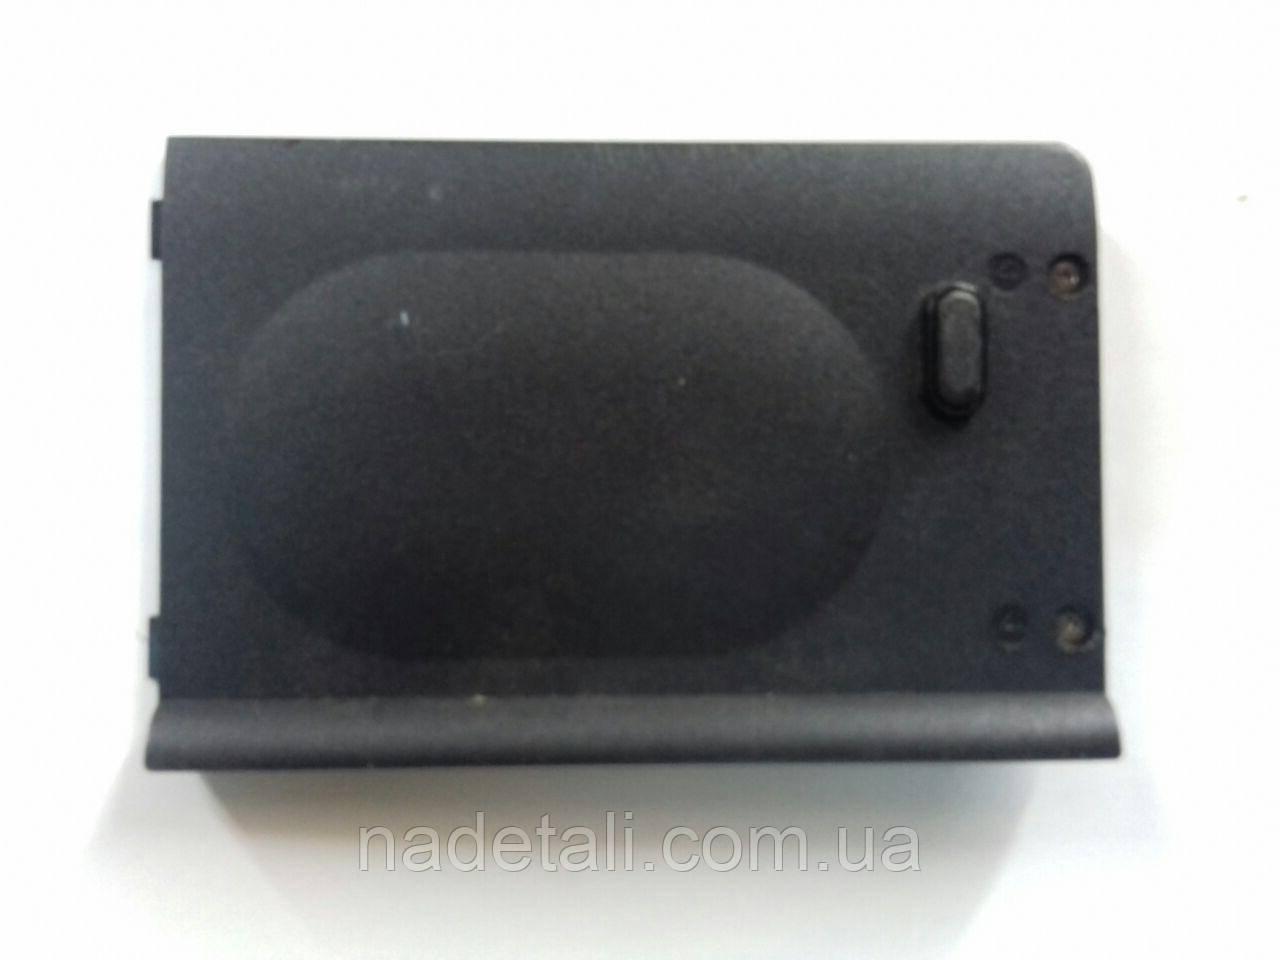 Сервисная крышка Toshiba L300 B024920181008604C